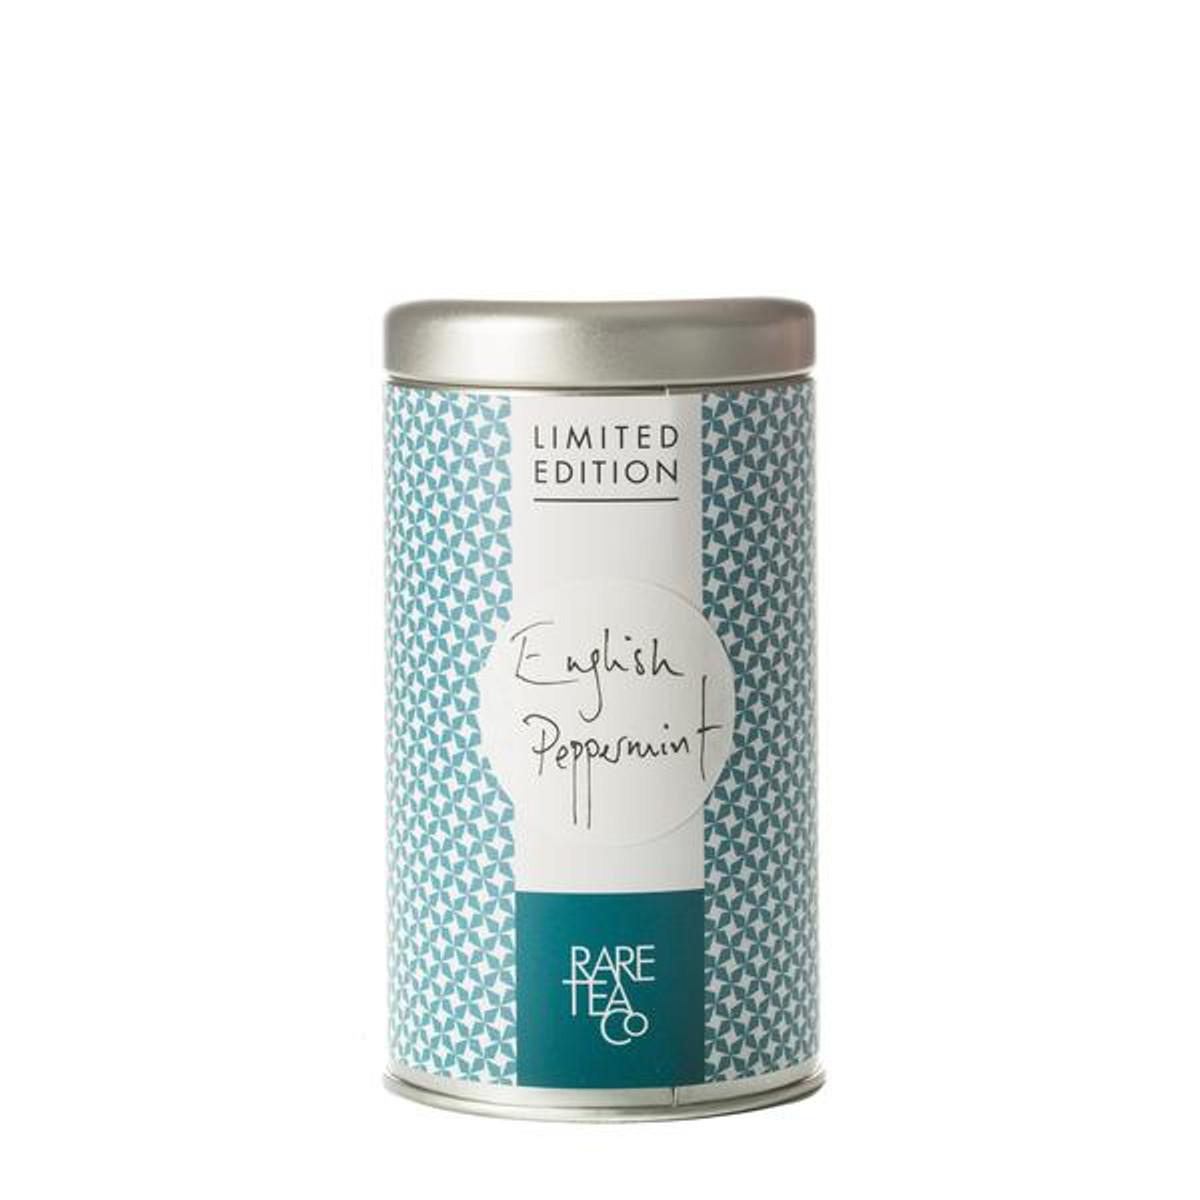 English Peppermint Tea